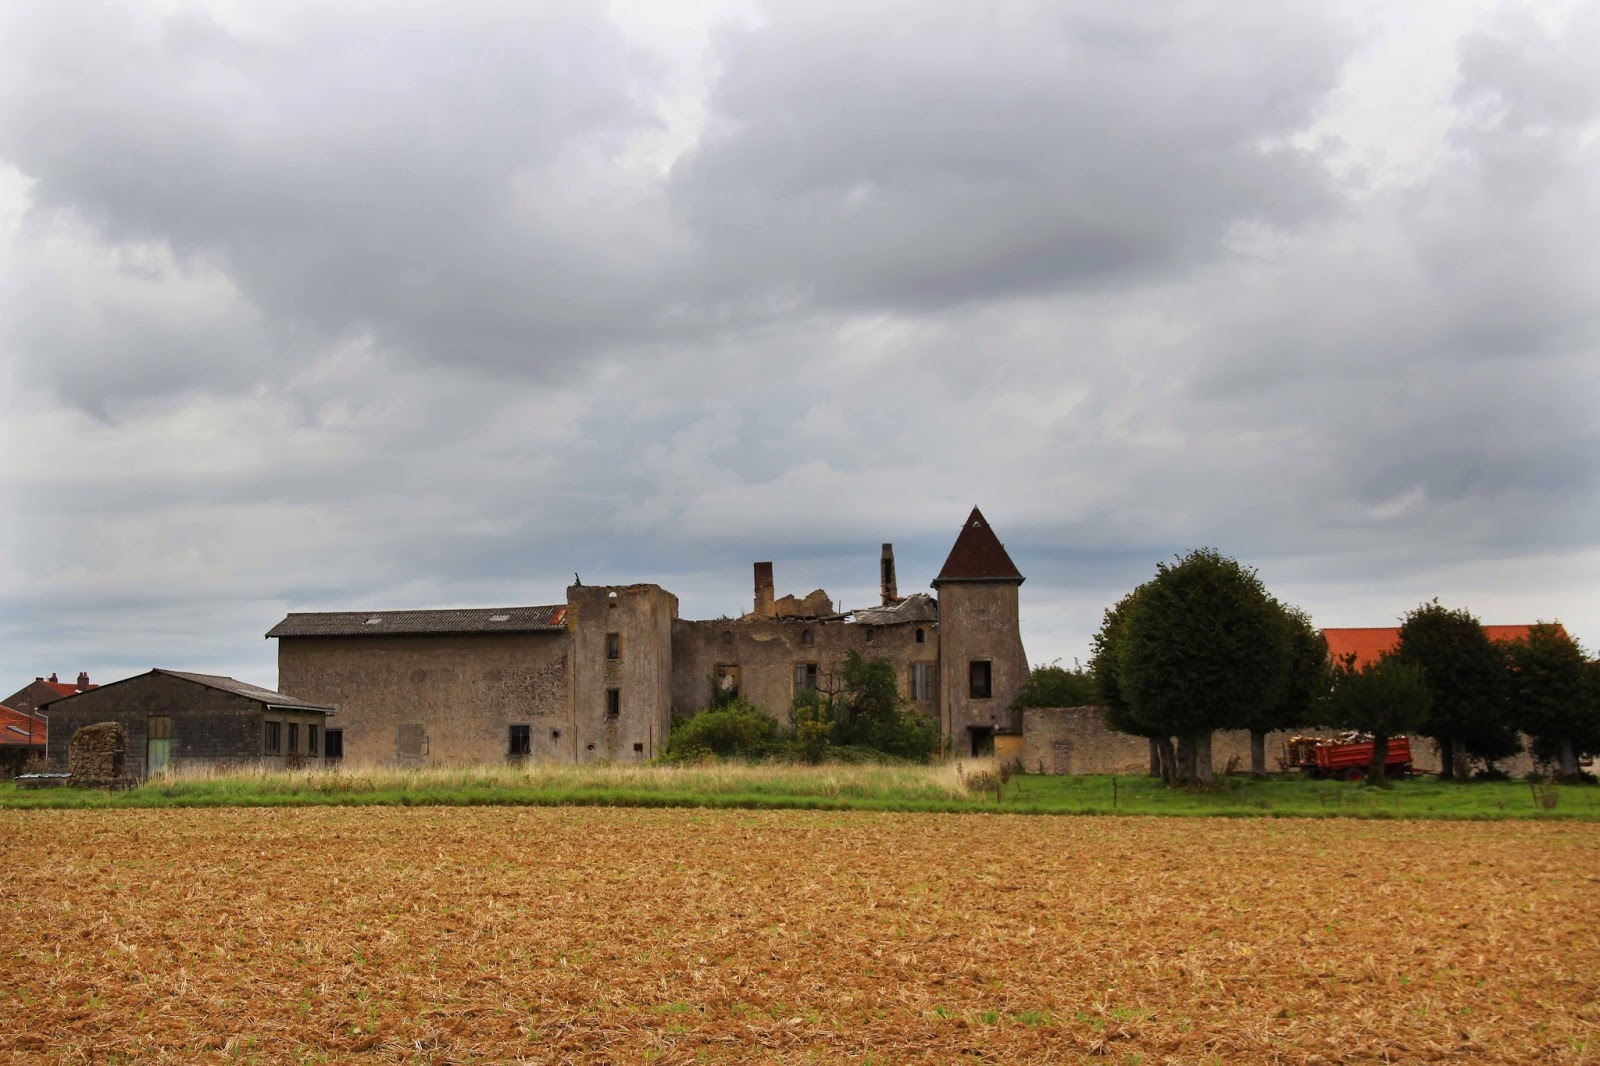 Glatigny France